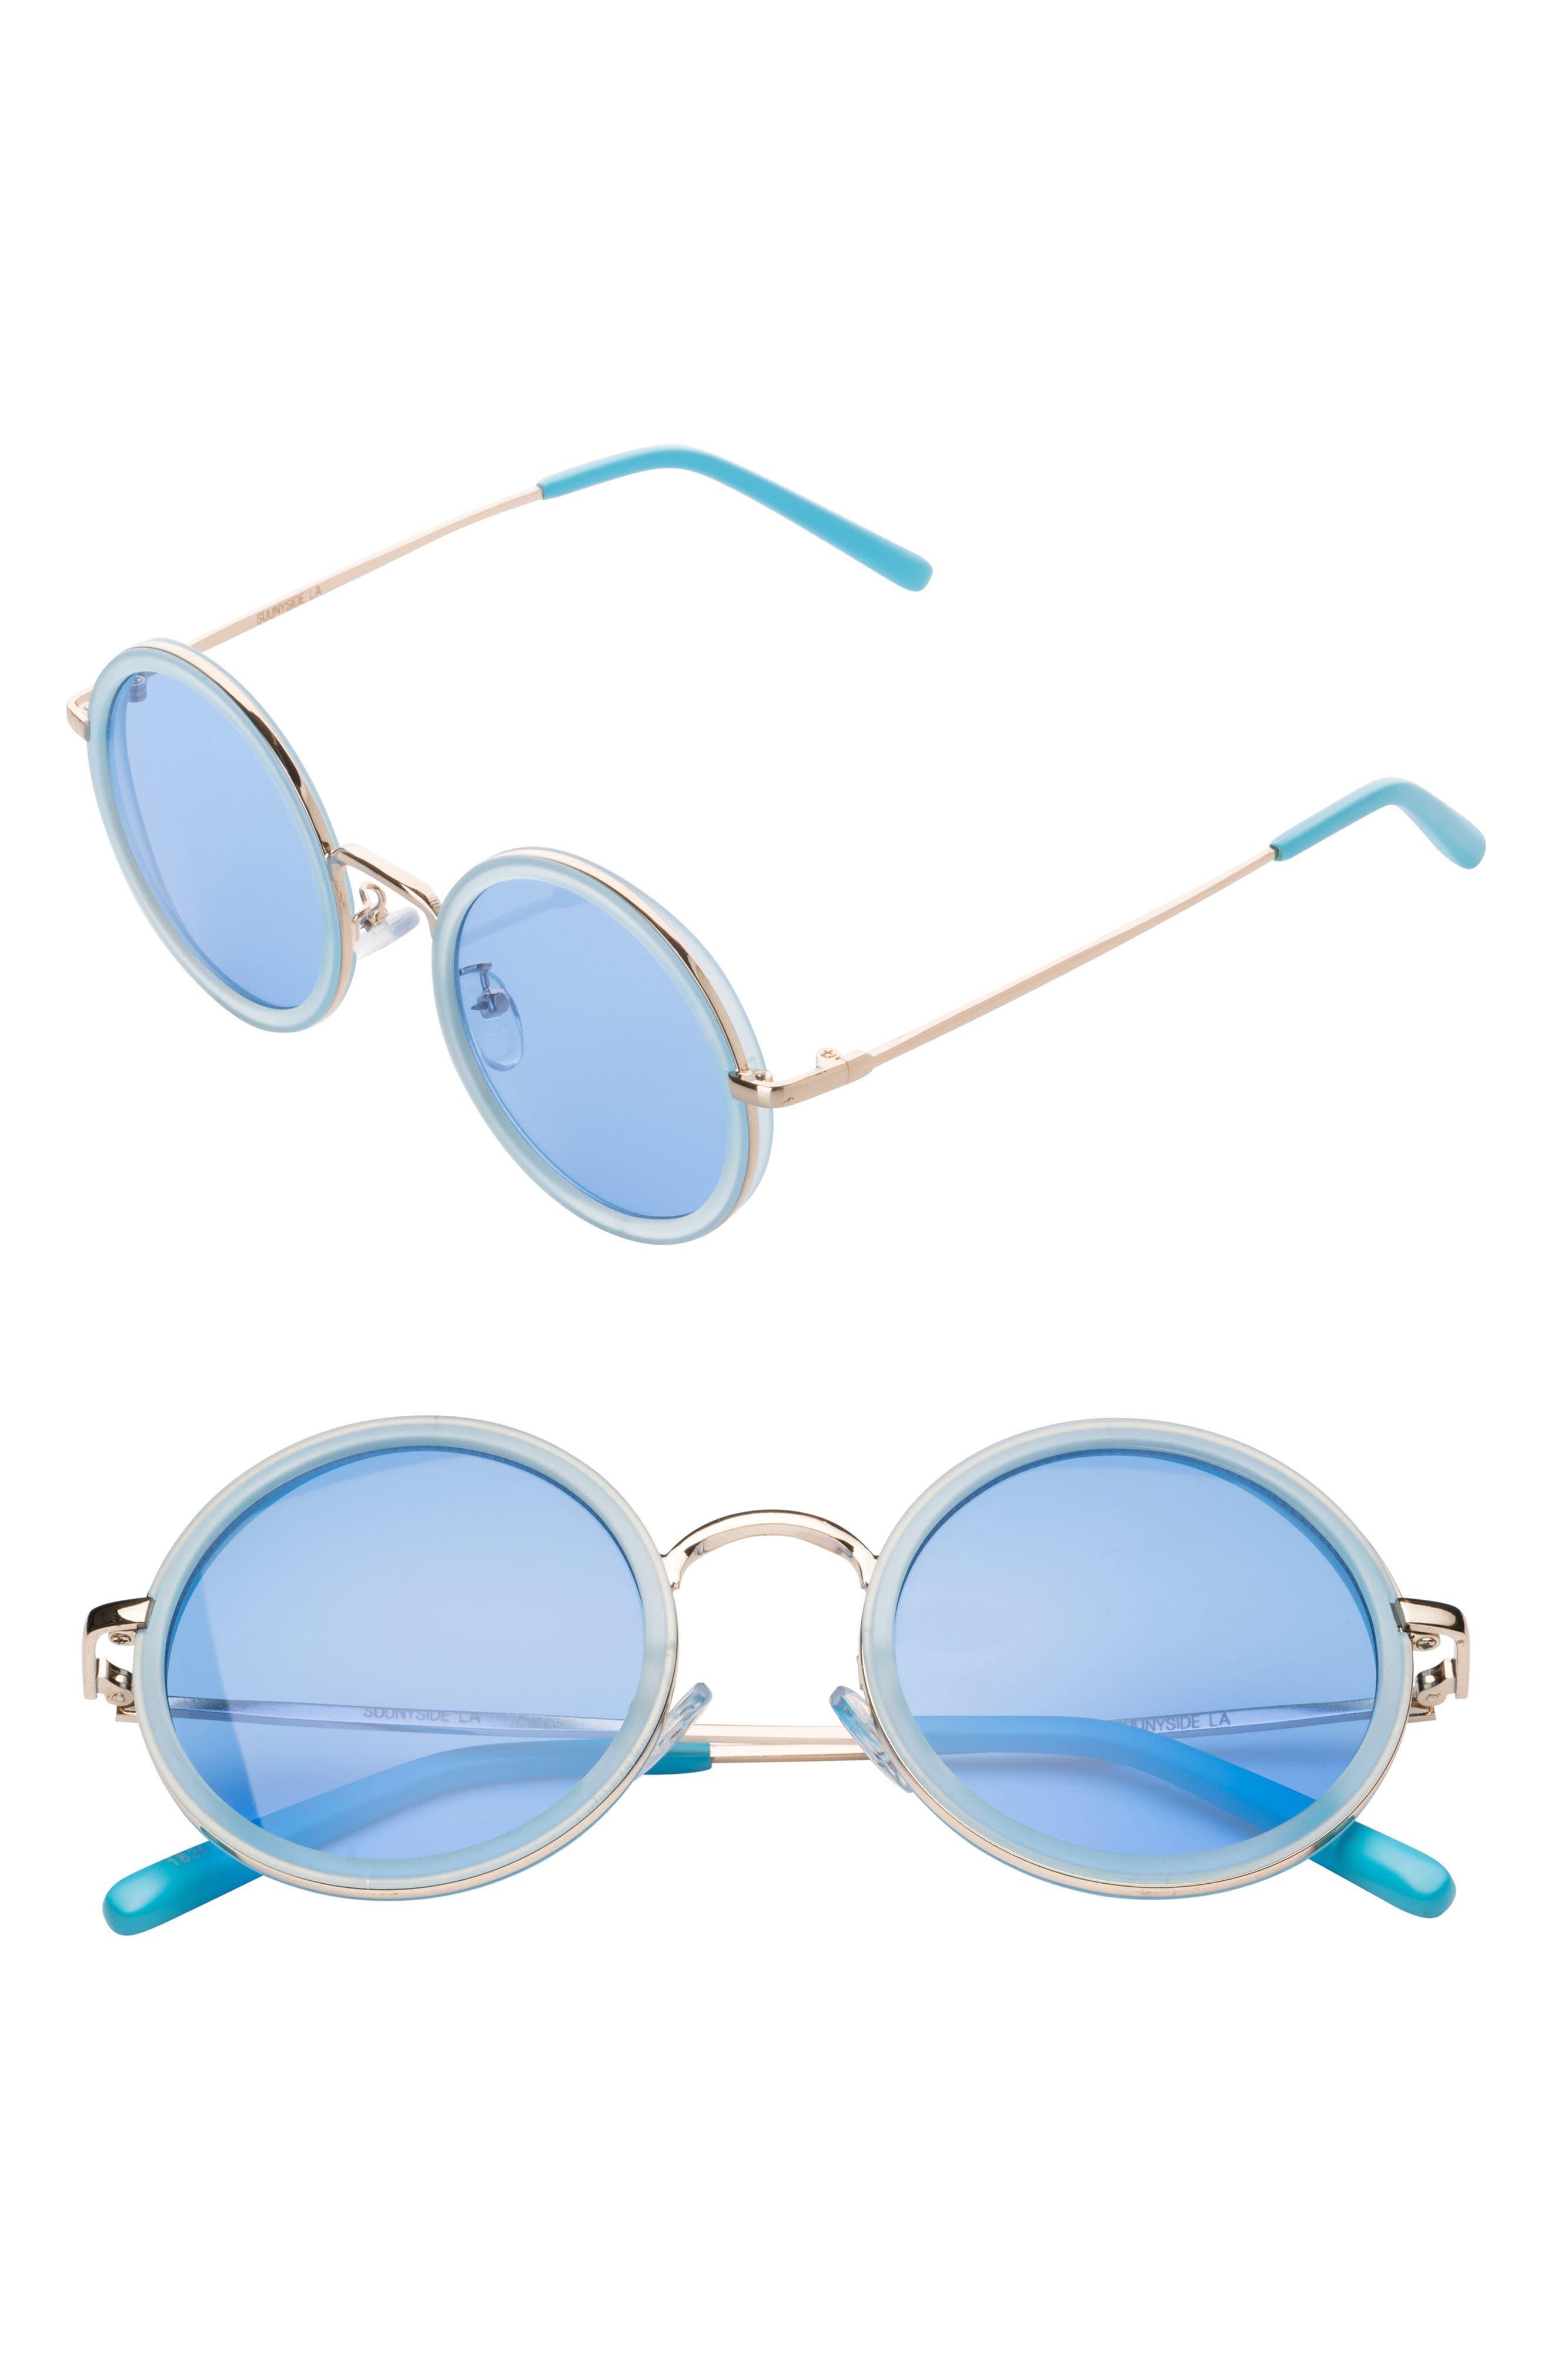 48mm Round Sunglasses,                             Main thumbnail 1, color,                             400